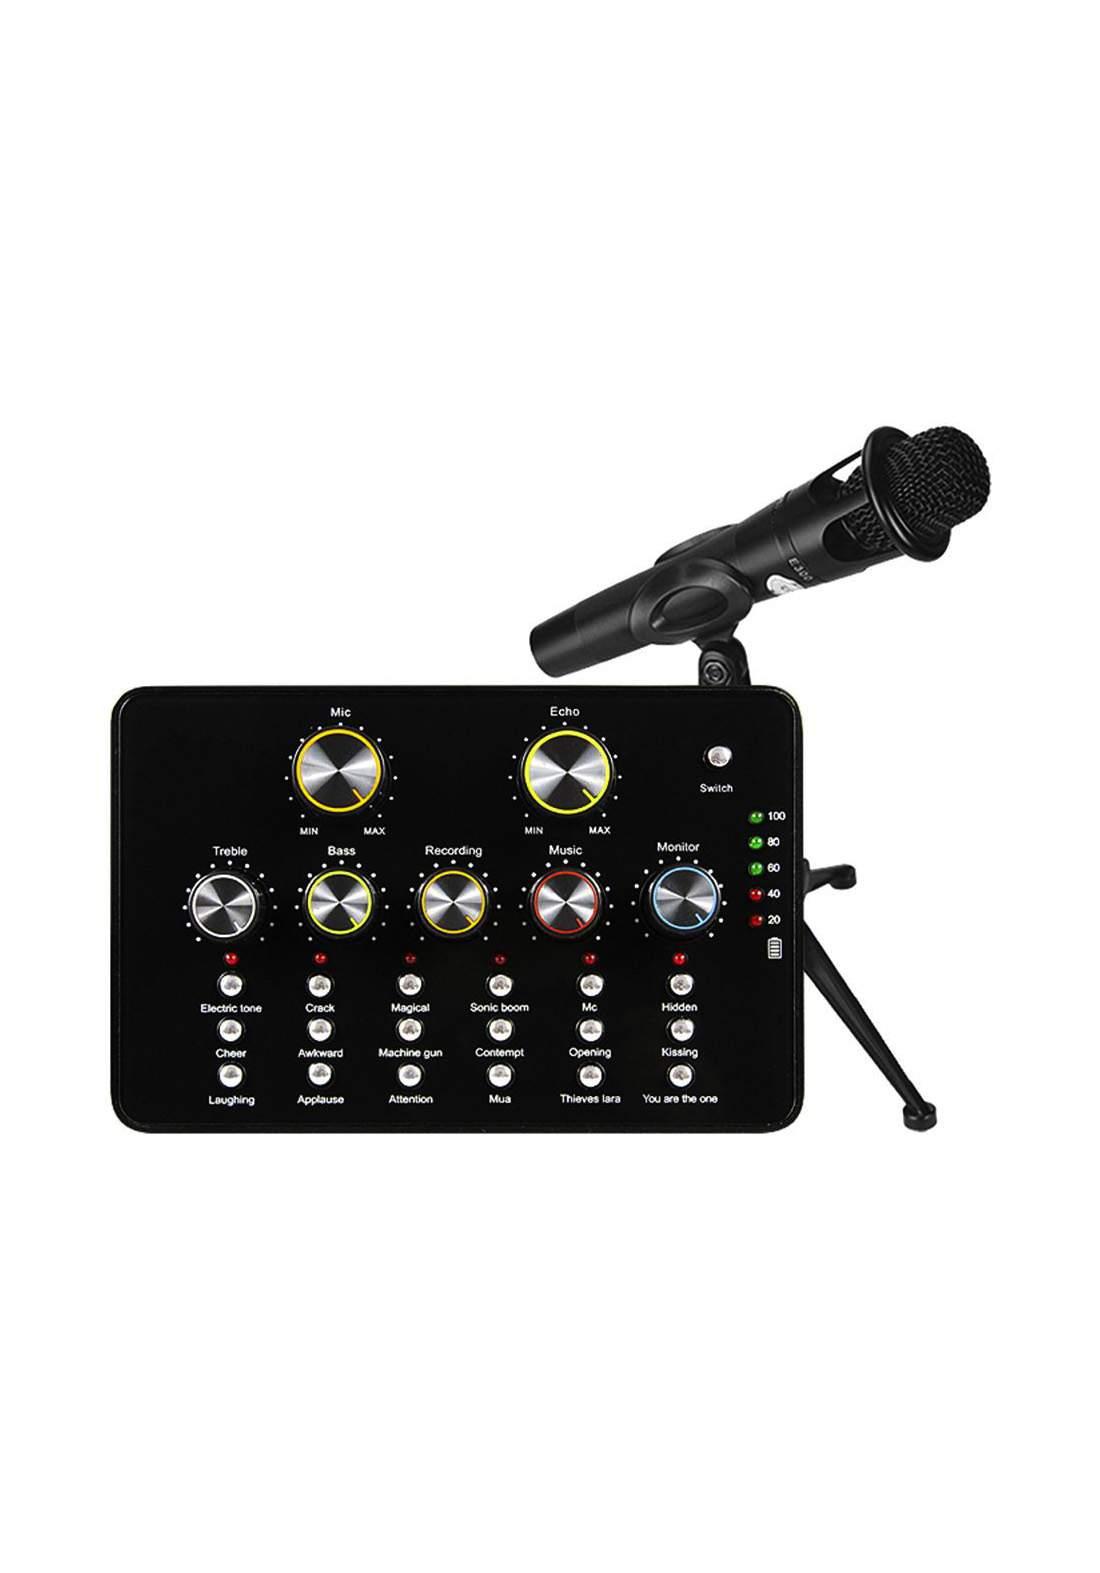 Miss-an Sound Card and Microphone V10 USB Audio  Portable -Black مايكروفون وكارت صوت